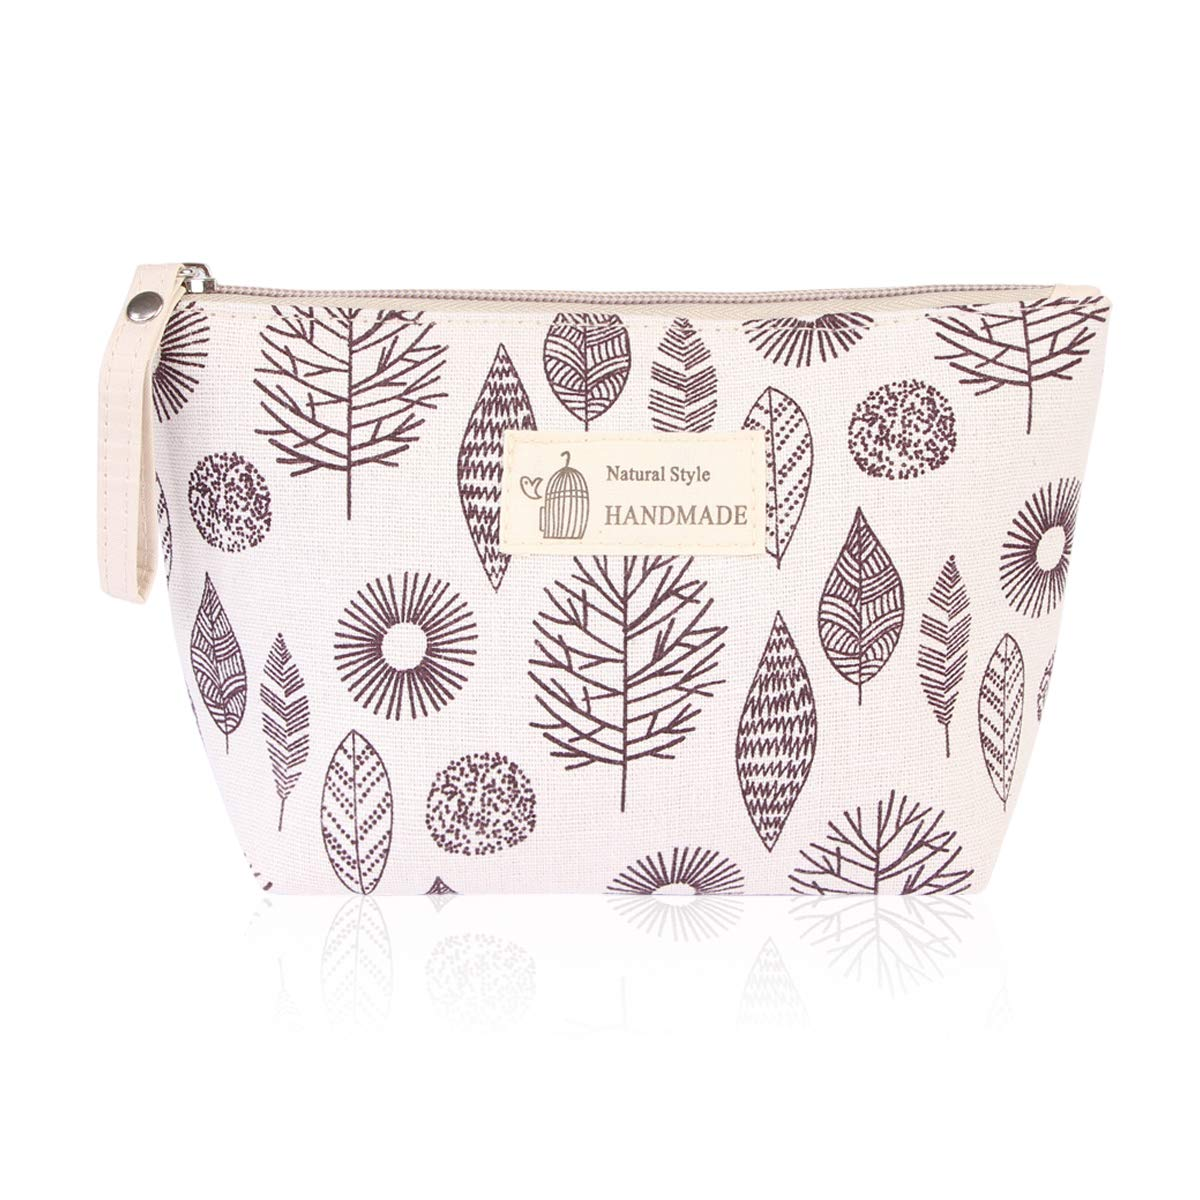 Portable Travel Clutch Cosmetic Makeup Pouch - Toiletry Organizer Purse, Striped Wristlet Floral, Plaid Print Bag (Trapezoid Pouch - Aztec Leaf)